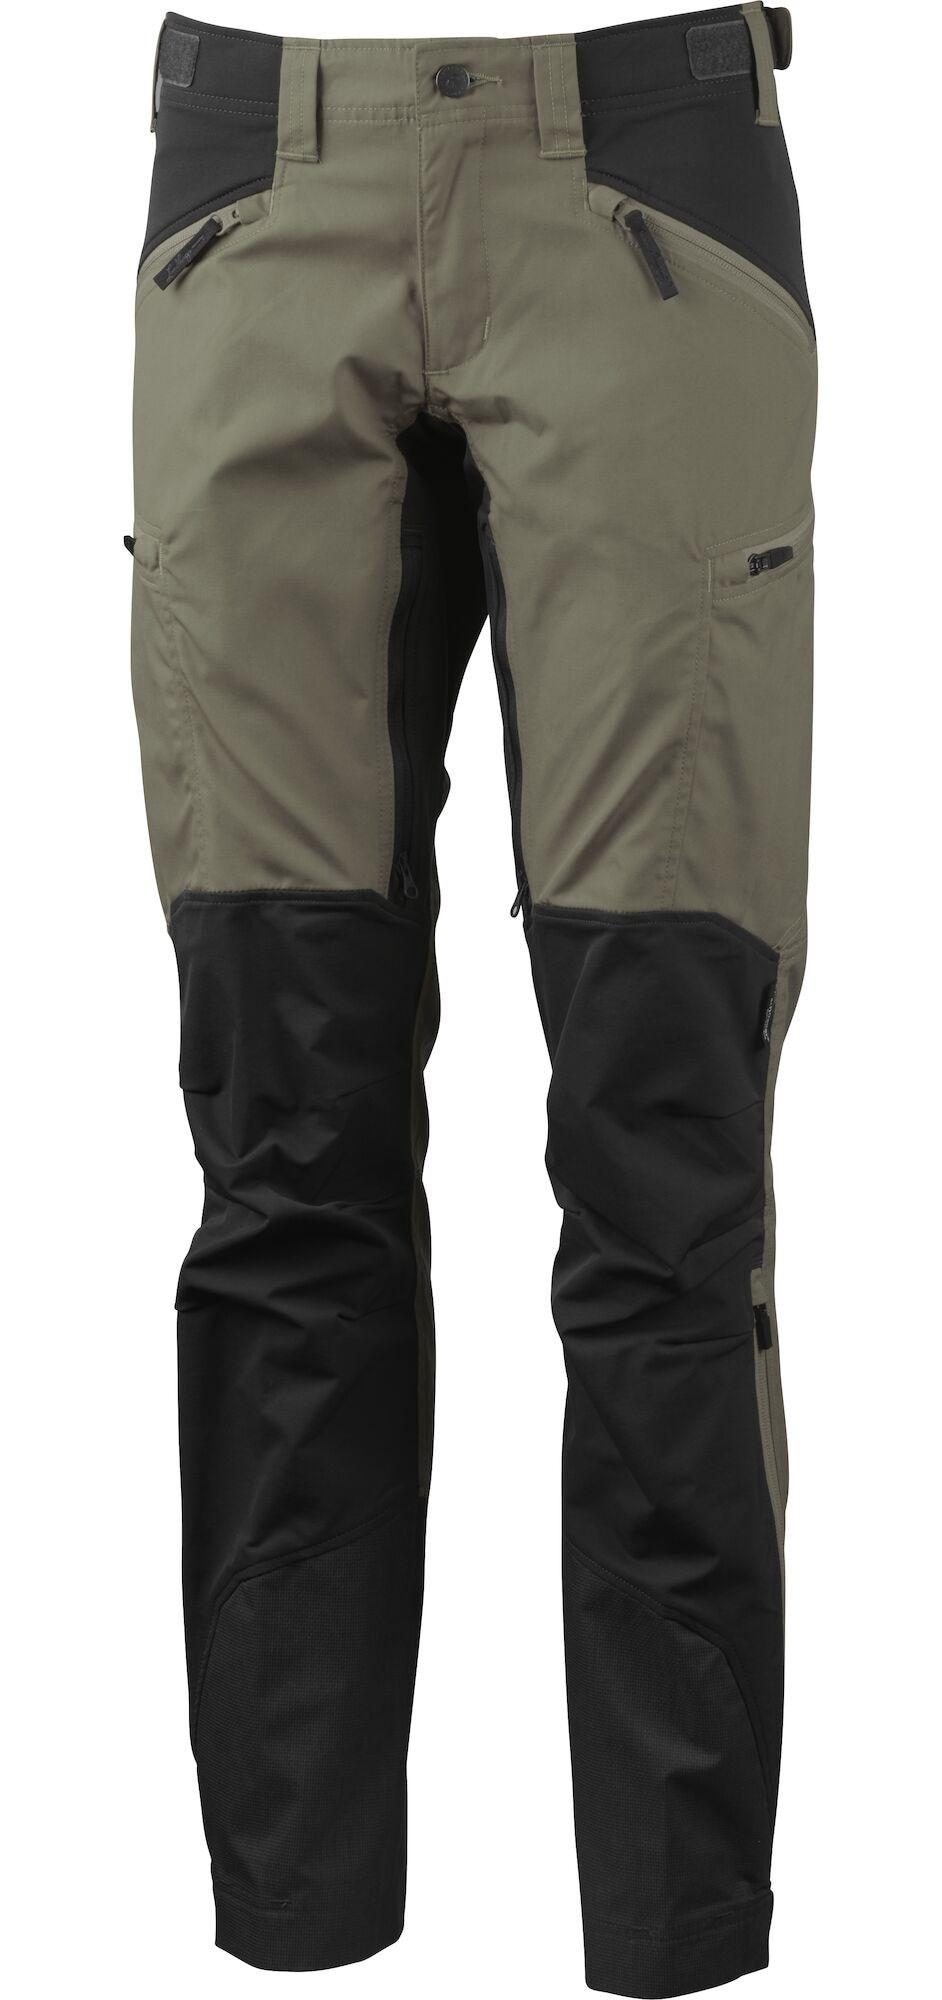 Lundhags Makke Pants, W's, Short